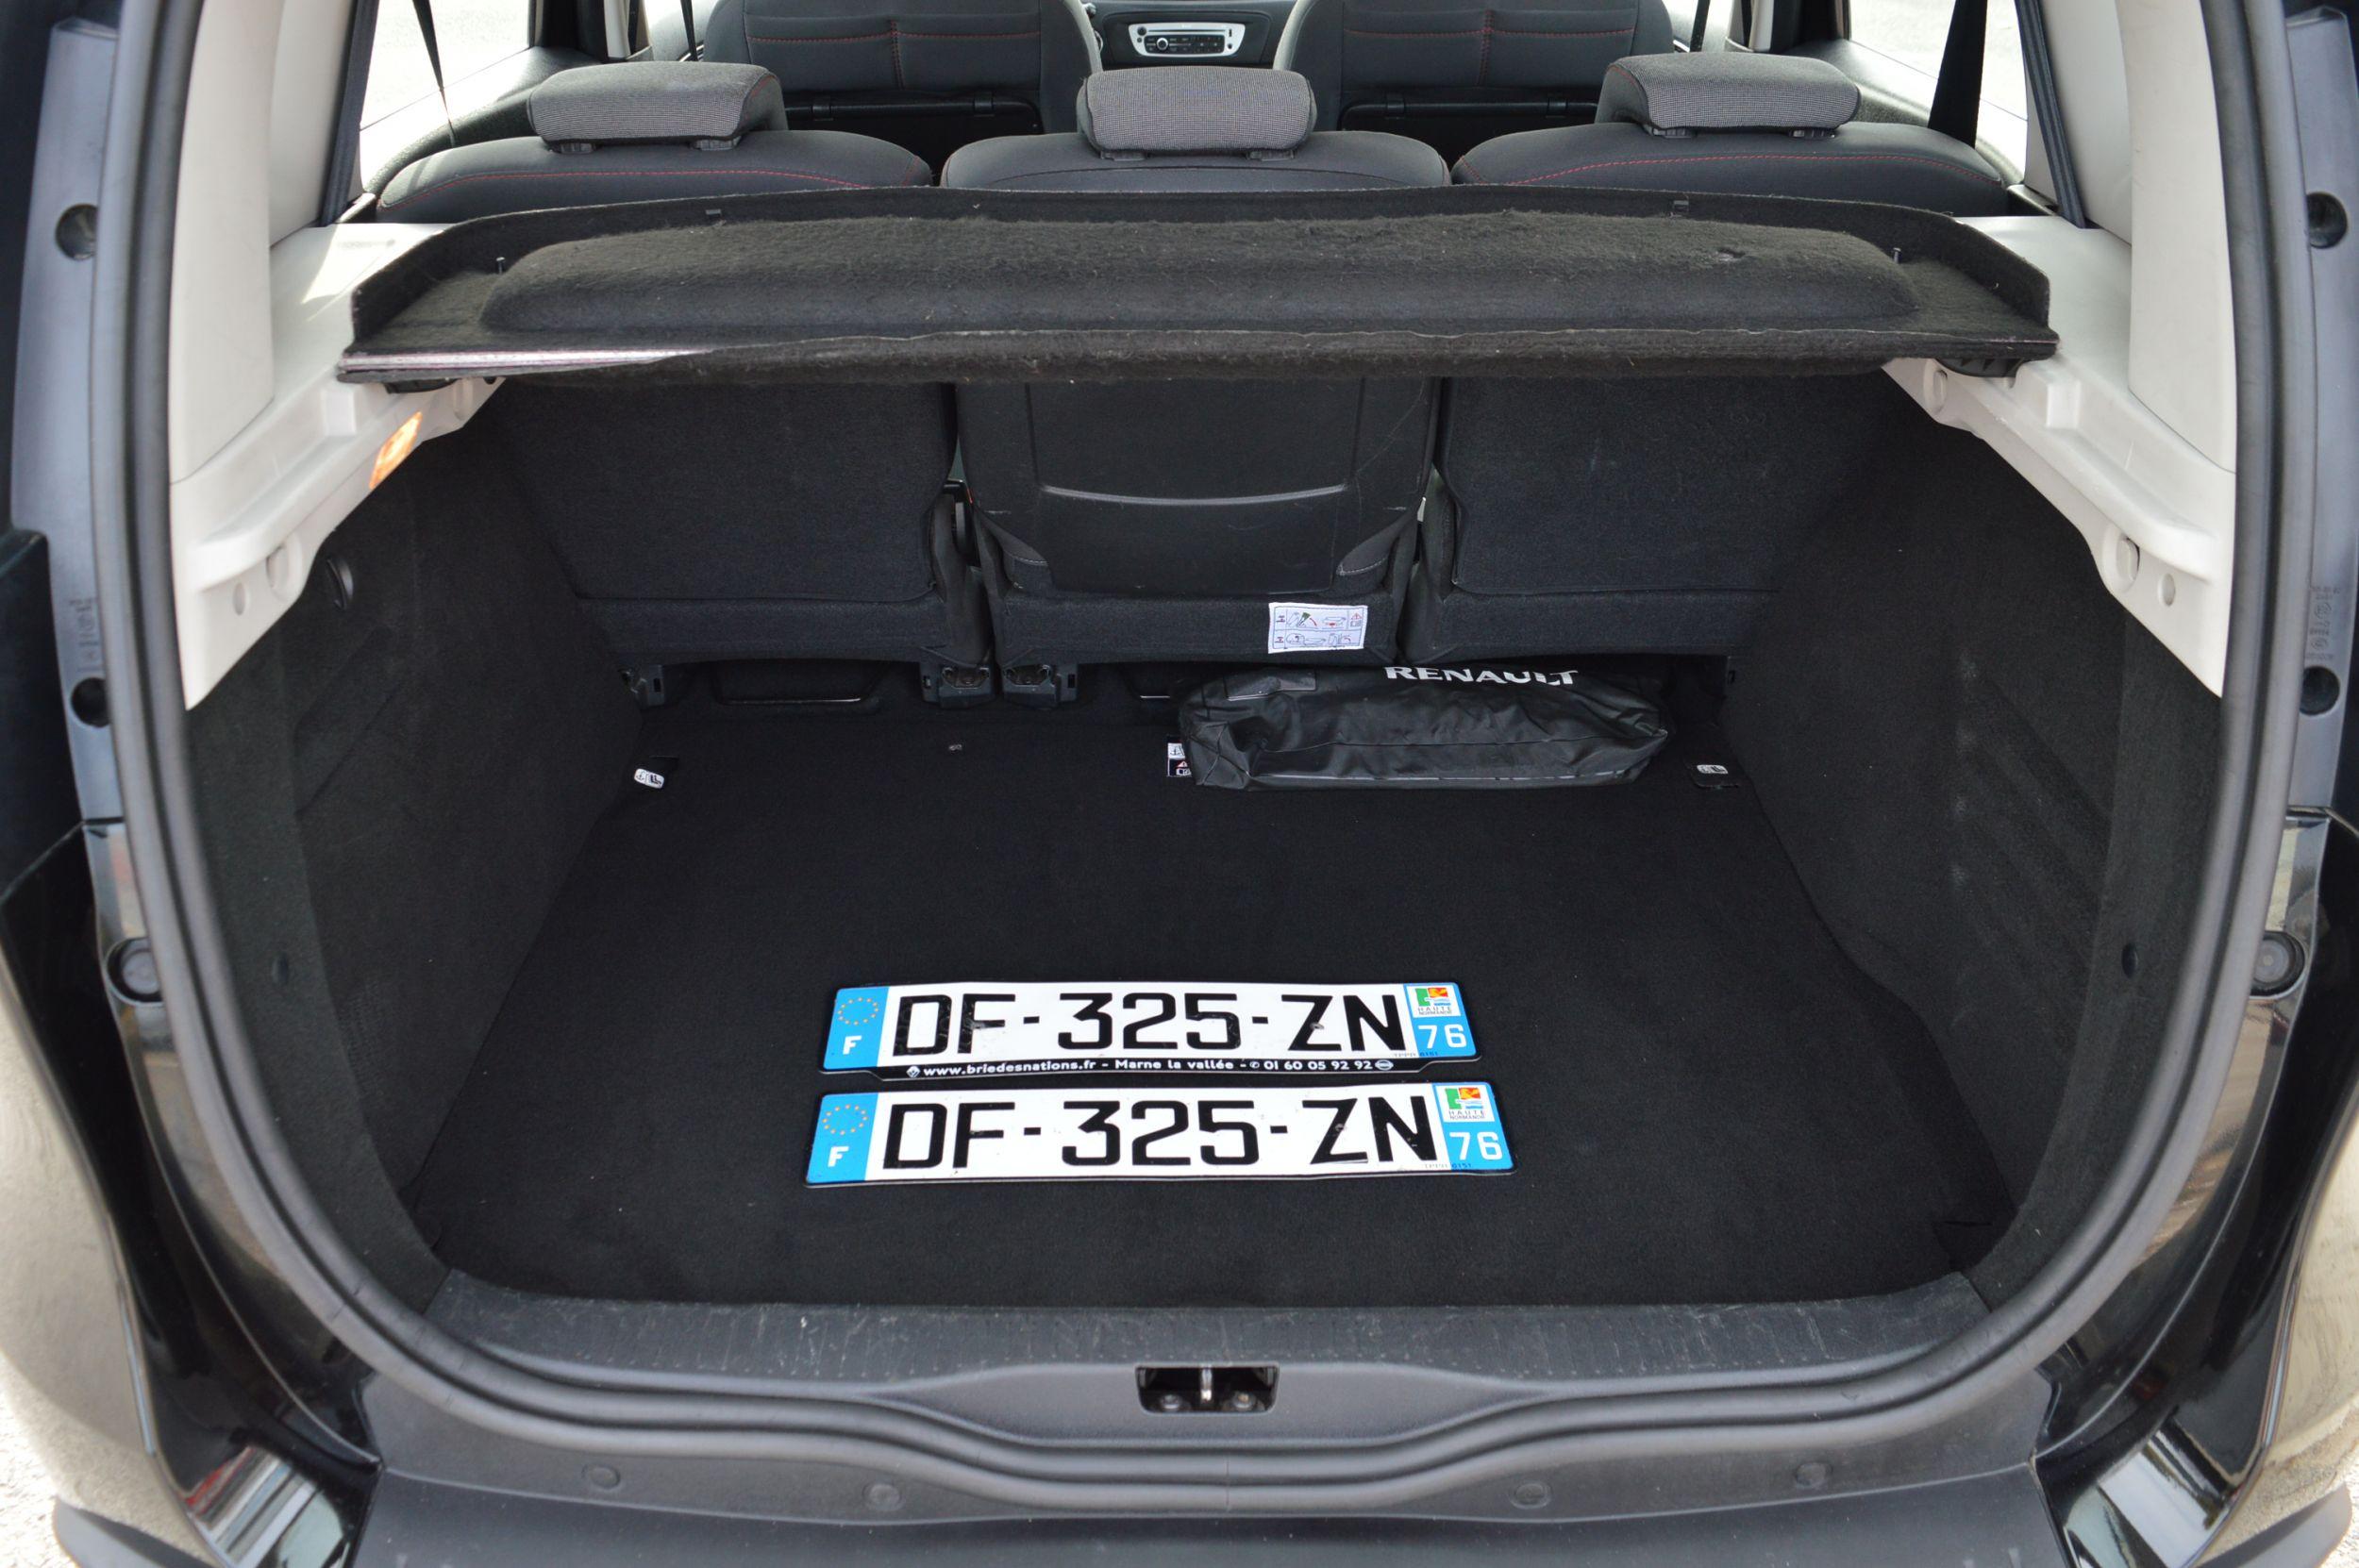 Renault Df056